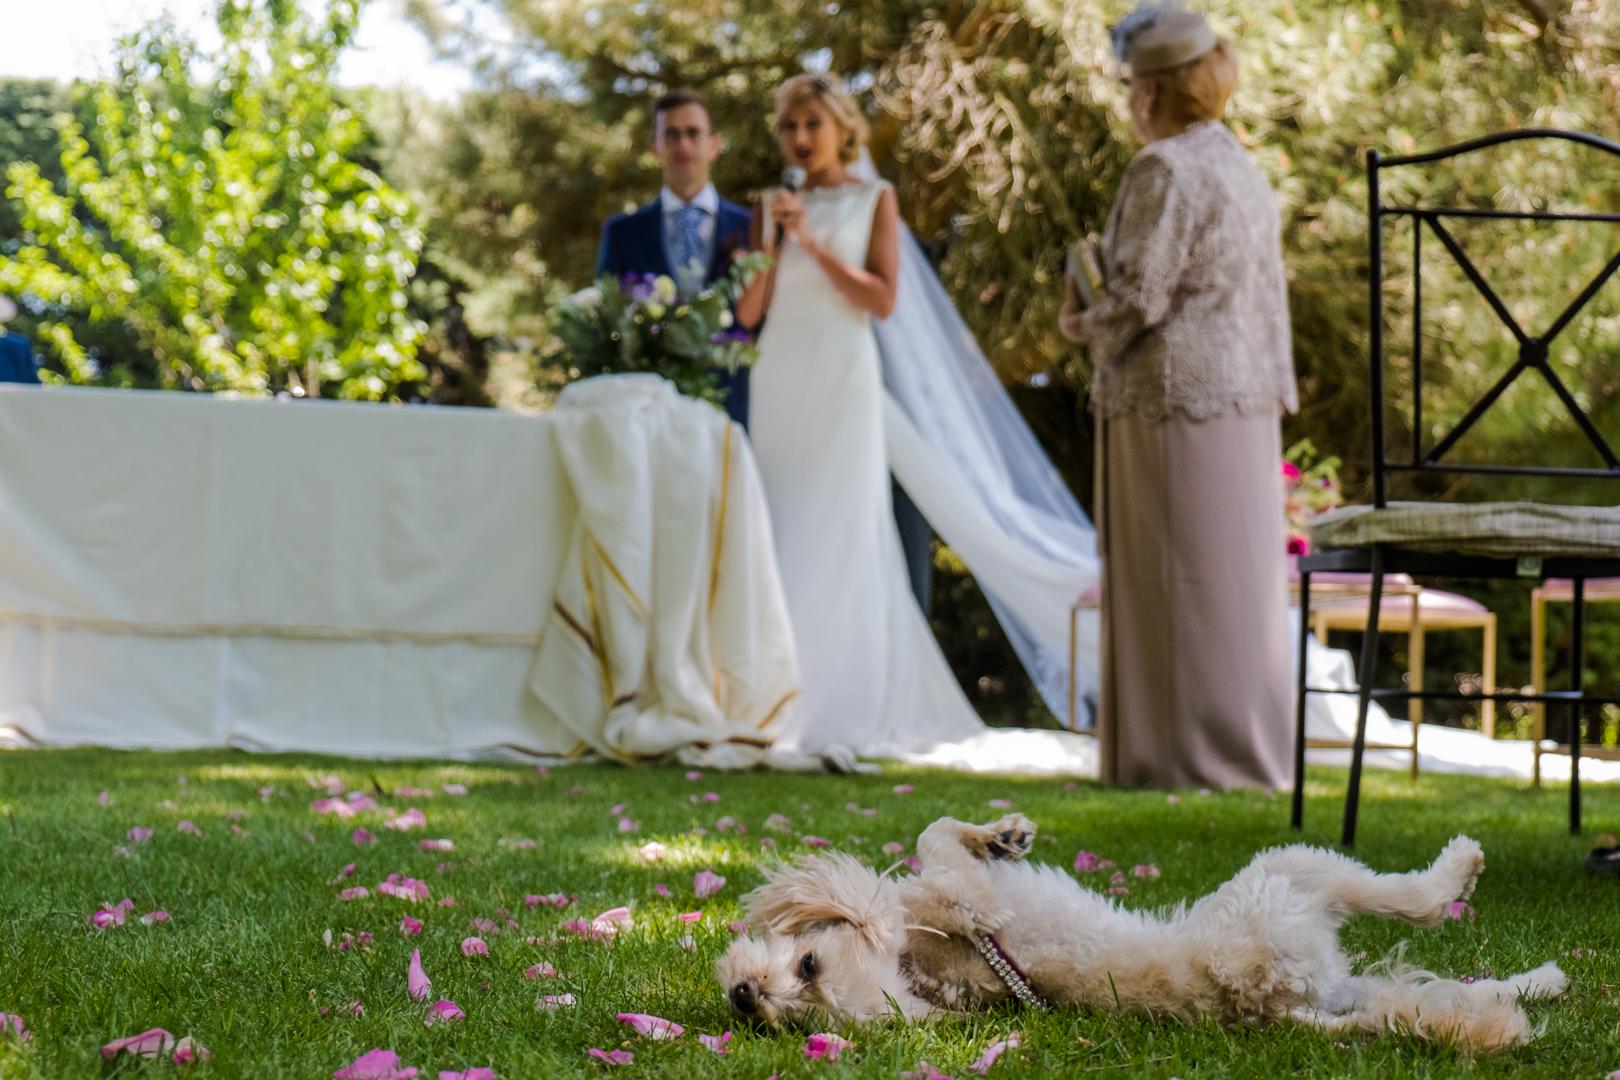 Boda-Sajorami-Beach-Cadiz-Zahora-Pedro-Gema-engagement-Rafael-Torres-fotografo-bodas-sevilla-madrid-barcelona-wedding-photographer--8-2.jpg